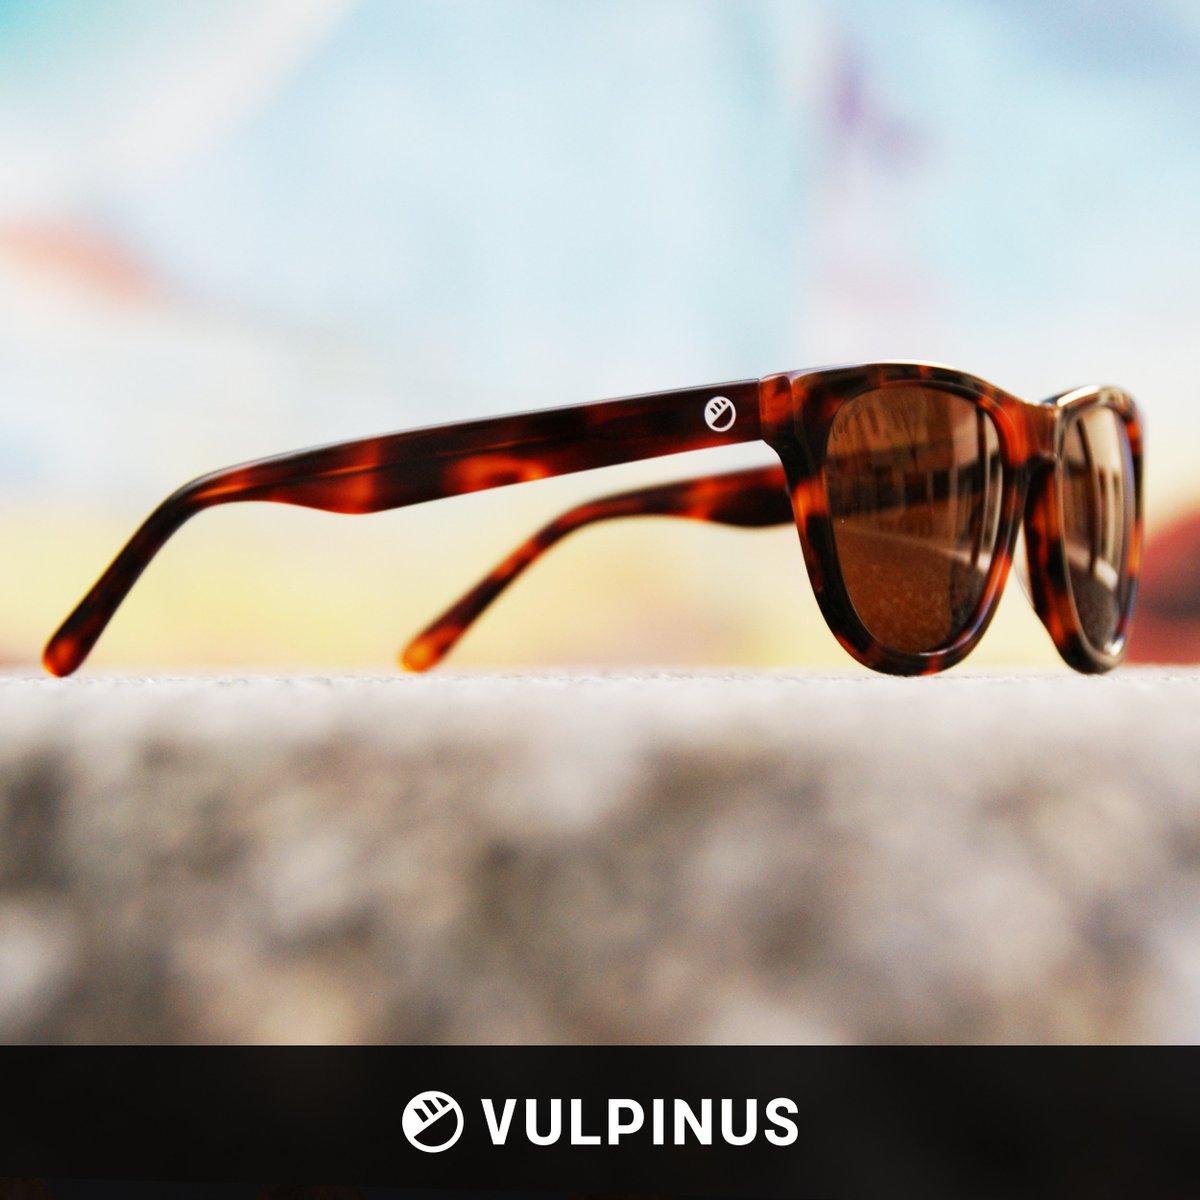 Vulpinus CASUAL a 29,95€ por tiempo limitado! Código: CASUAL2995 ⭐️ https://t.co/Q5s0myCmpR #Sunglasses #gafas #Barcelona #summer #casual https://t.co/zFxIAOzMAf